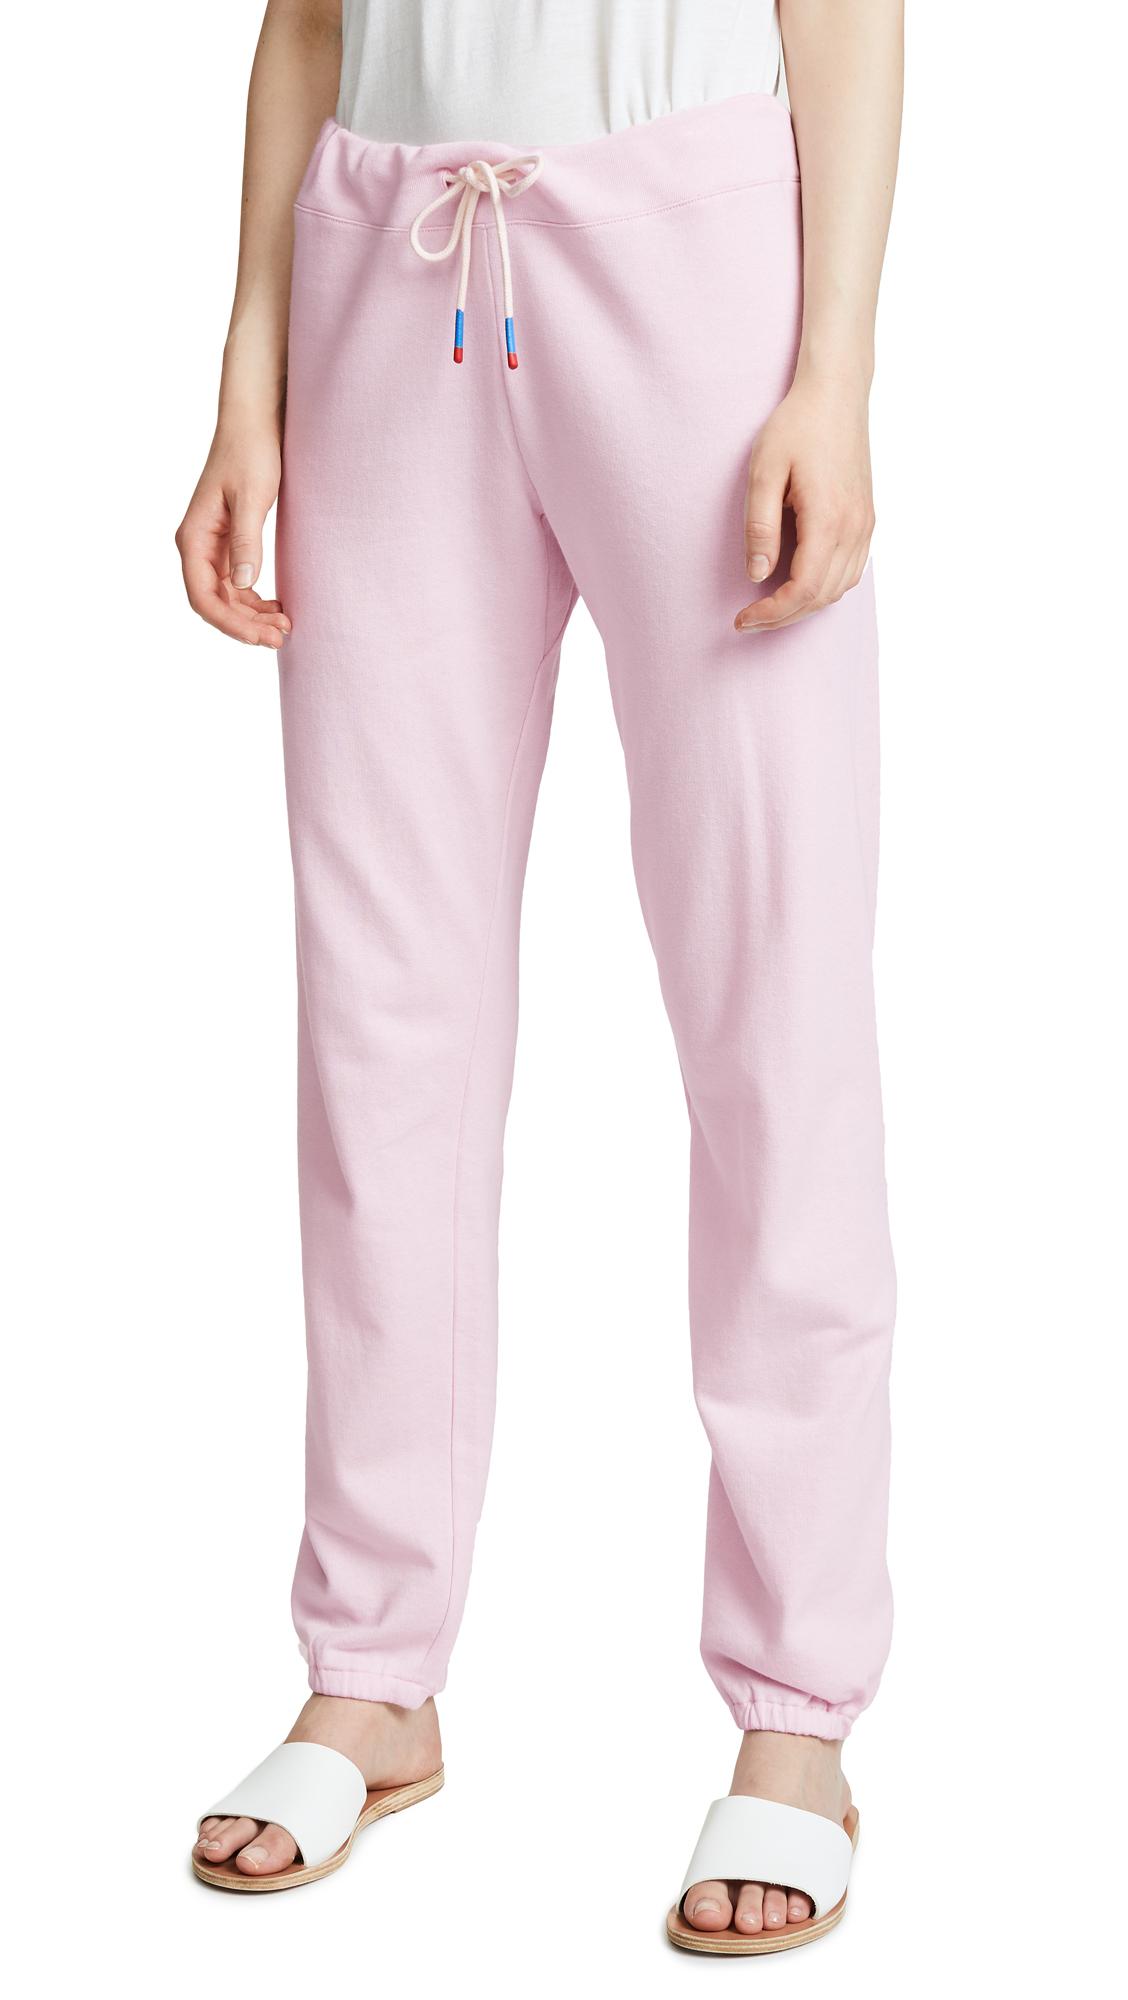 Tory Sport Soft Knit Sweatpants